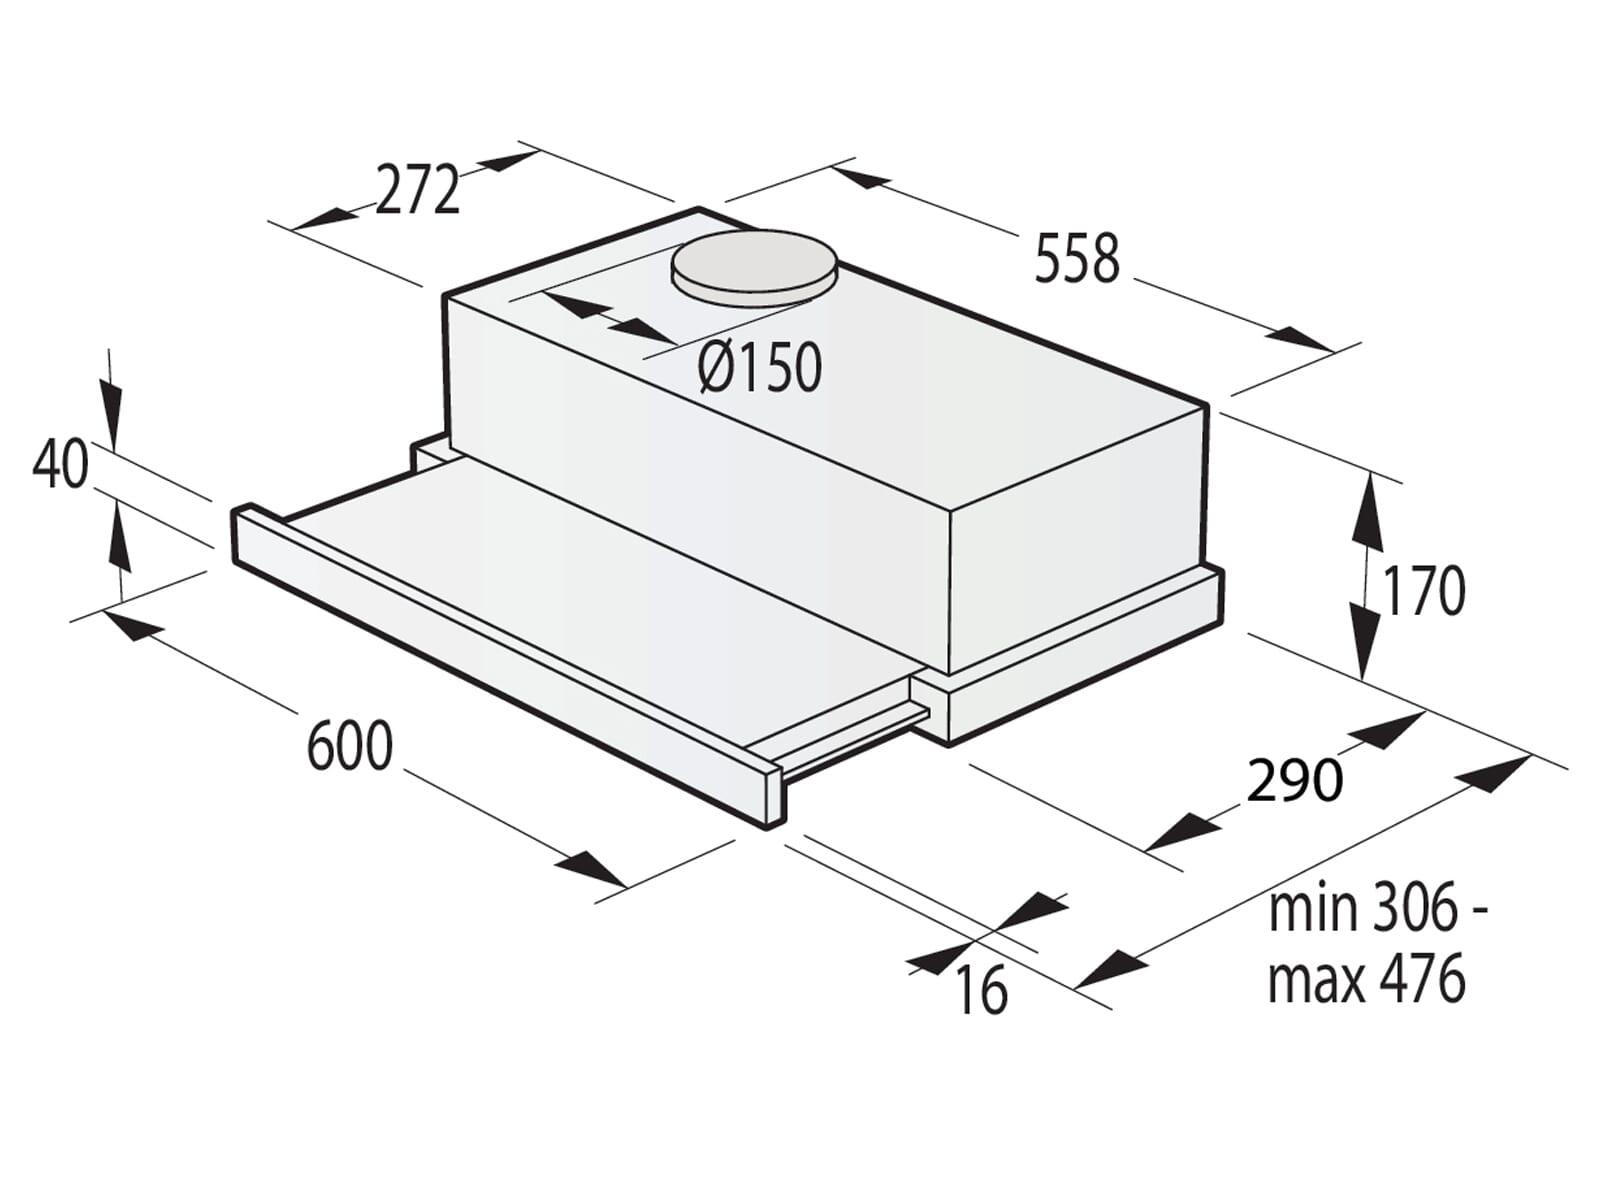 Gorenje TH64E4BG Flachschirm-Dunstabzugshaube 60 cm Schwarz